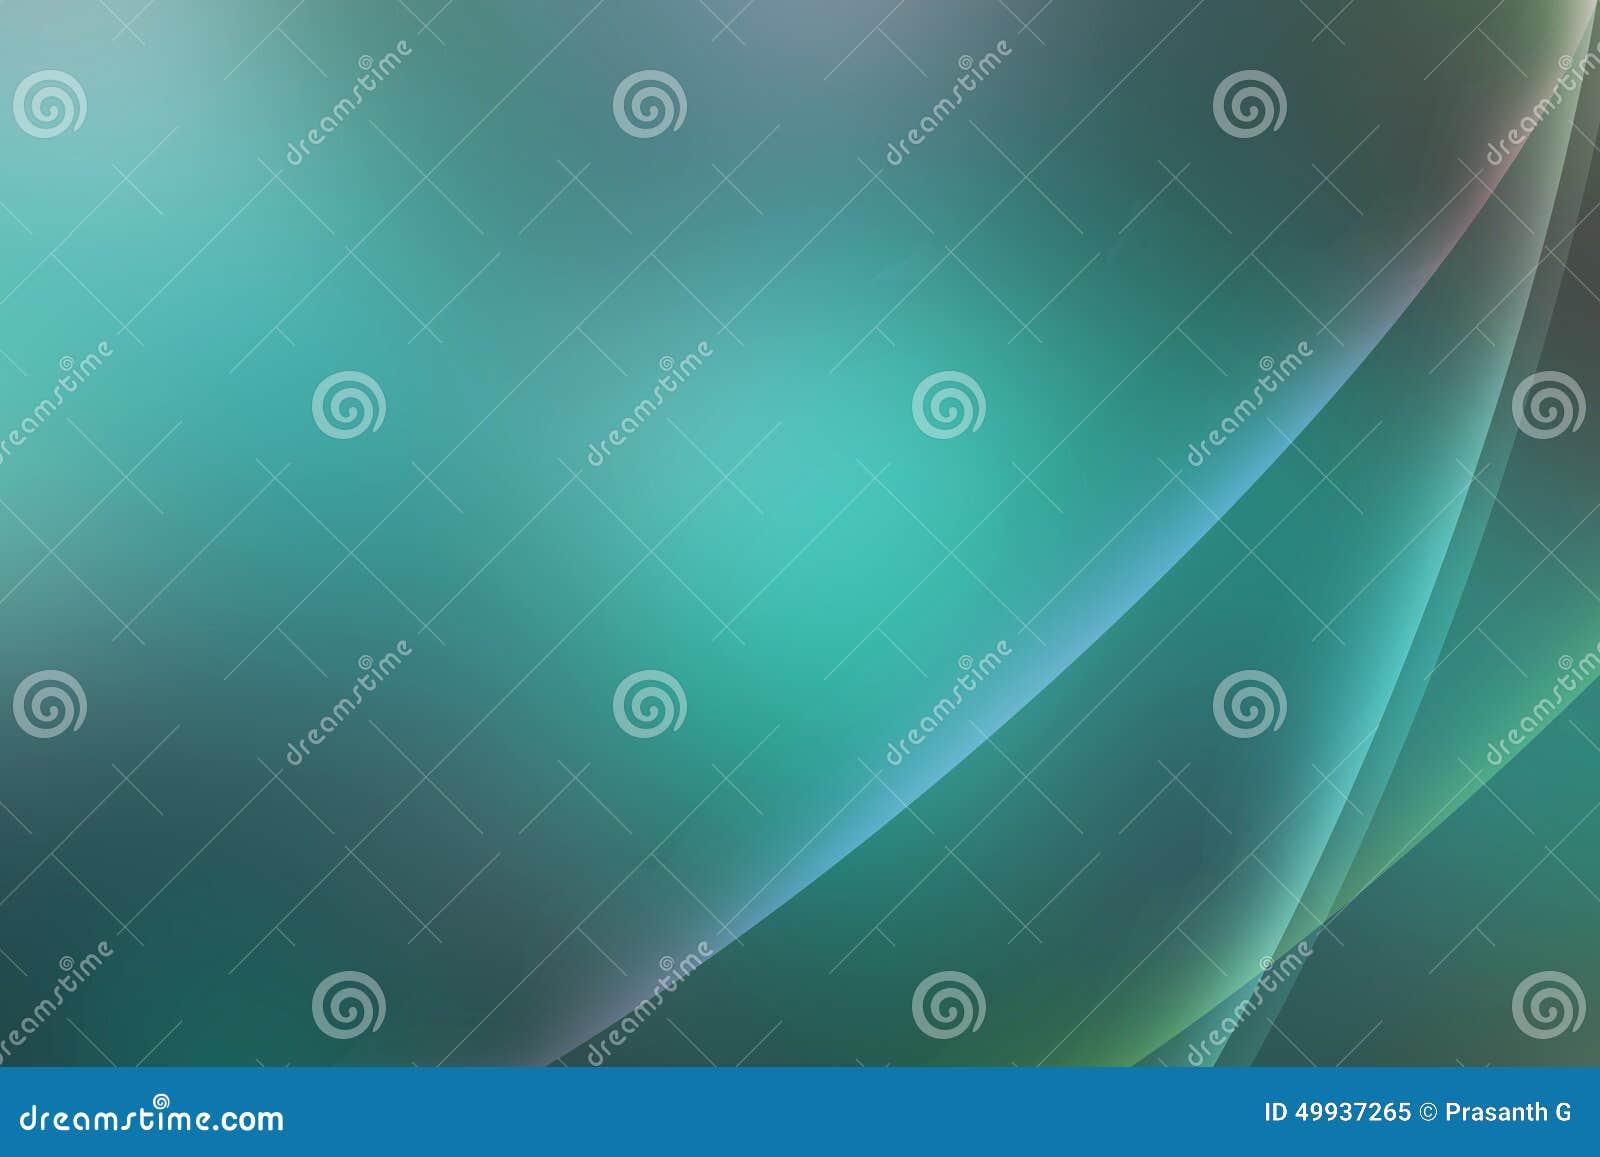 Abstract aurora wallpaper